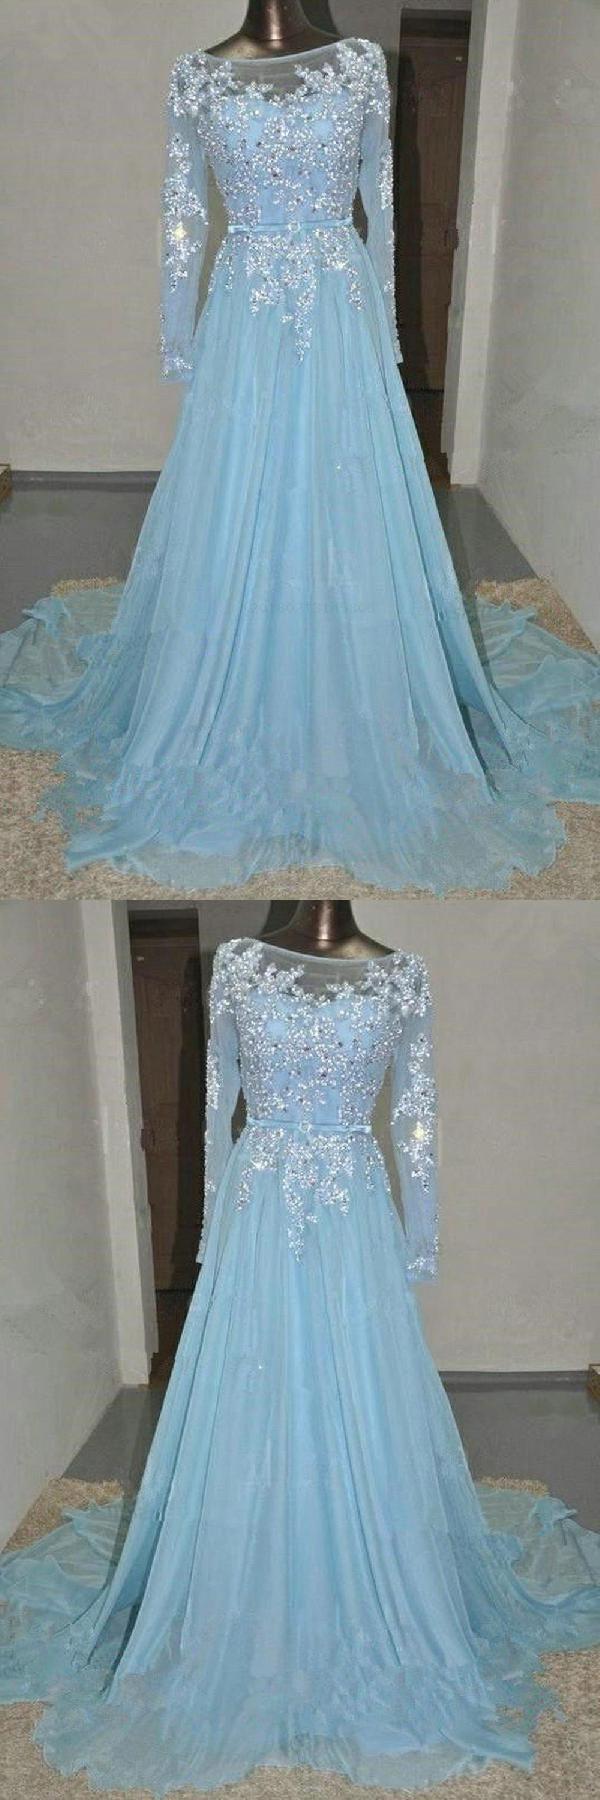 Long sleeves prom dress longsleevespromdress lace prom dress